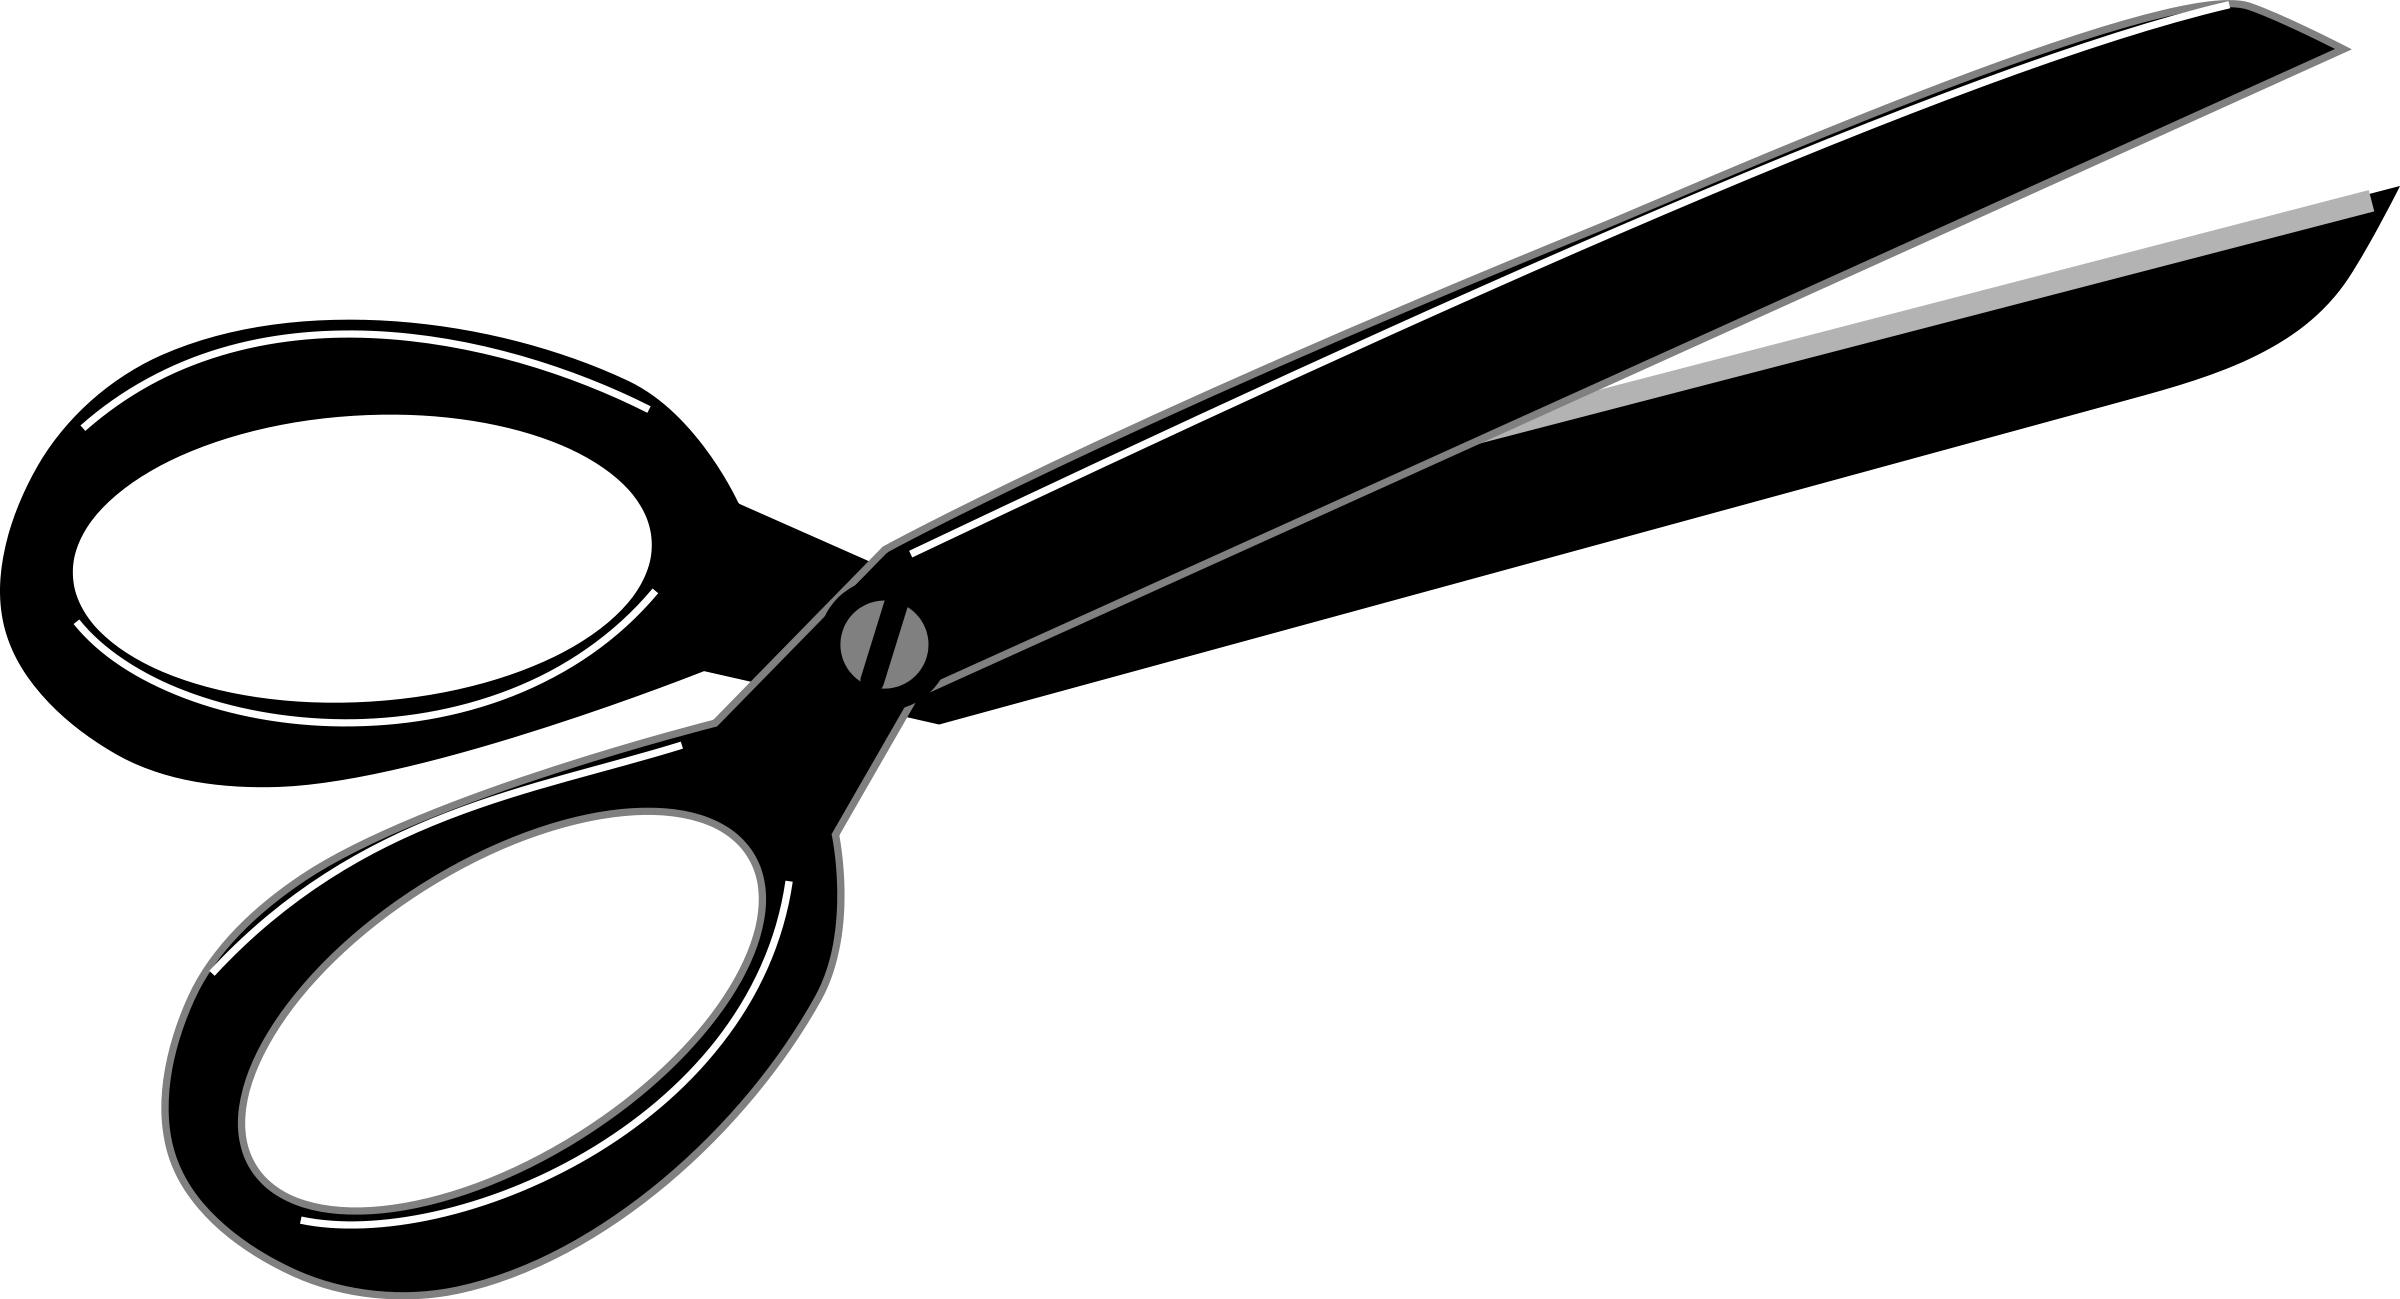 PNG File Name: Scissors PlusPng.com  - Scissor PNG